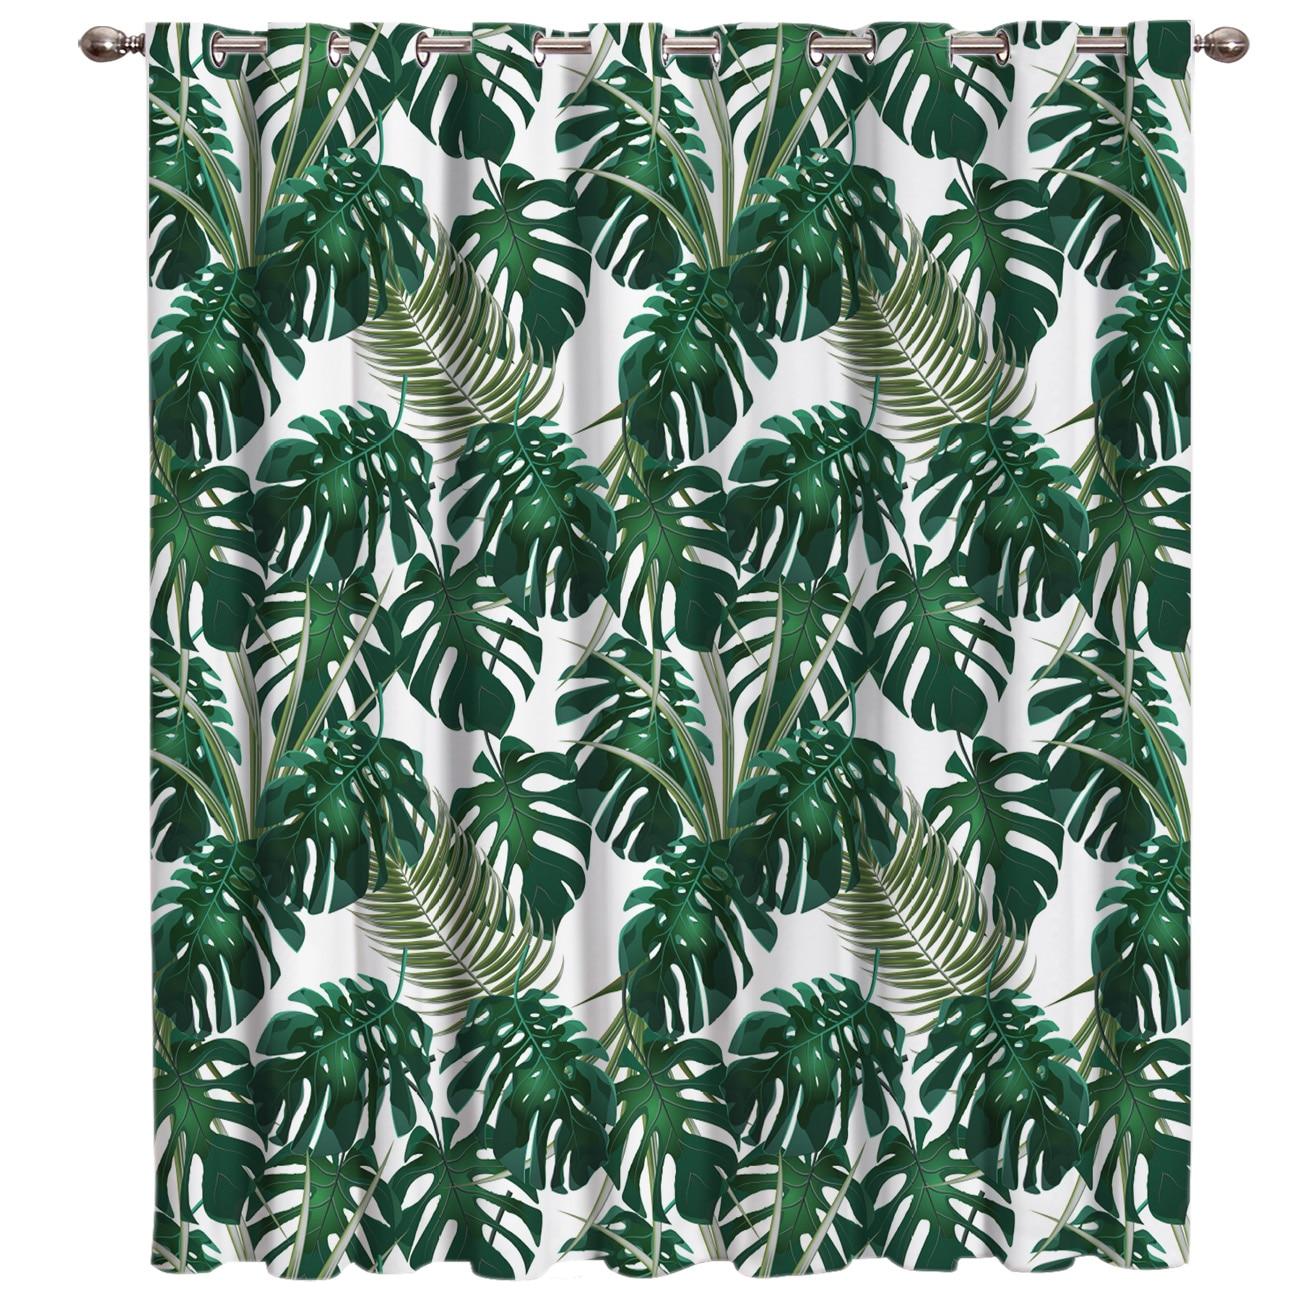 Nordic Windy Tropical Banana Leaves Window Treatments Curtains Valance Living Room Decor Bathroom Outdoor Fabric Curtain